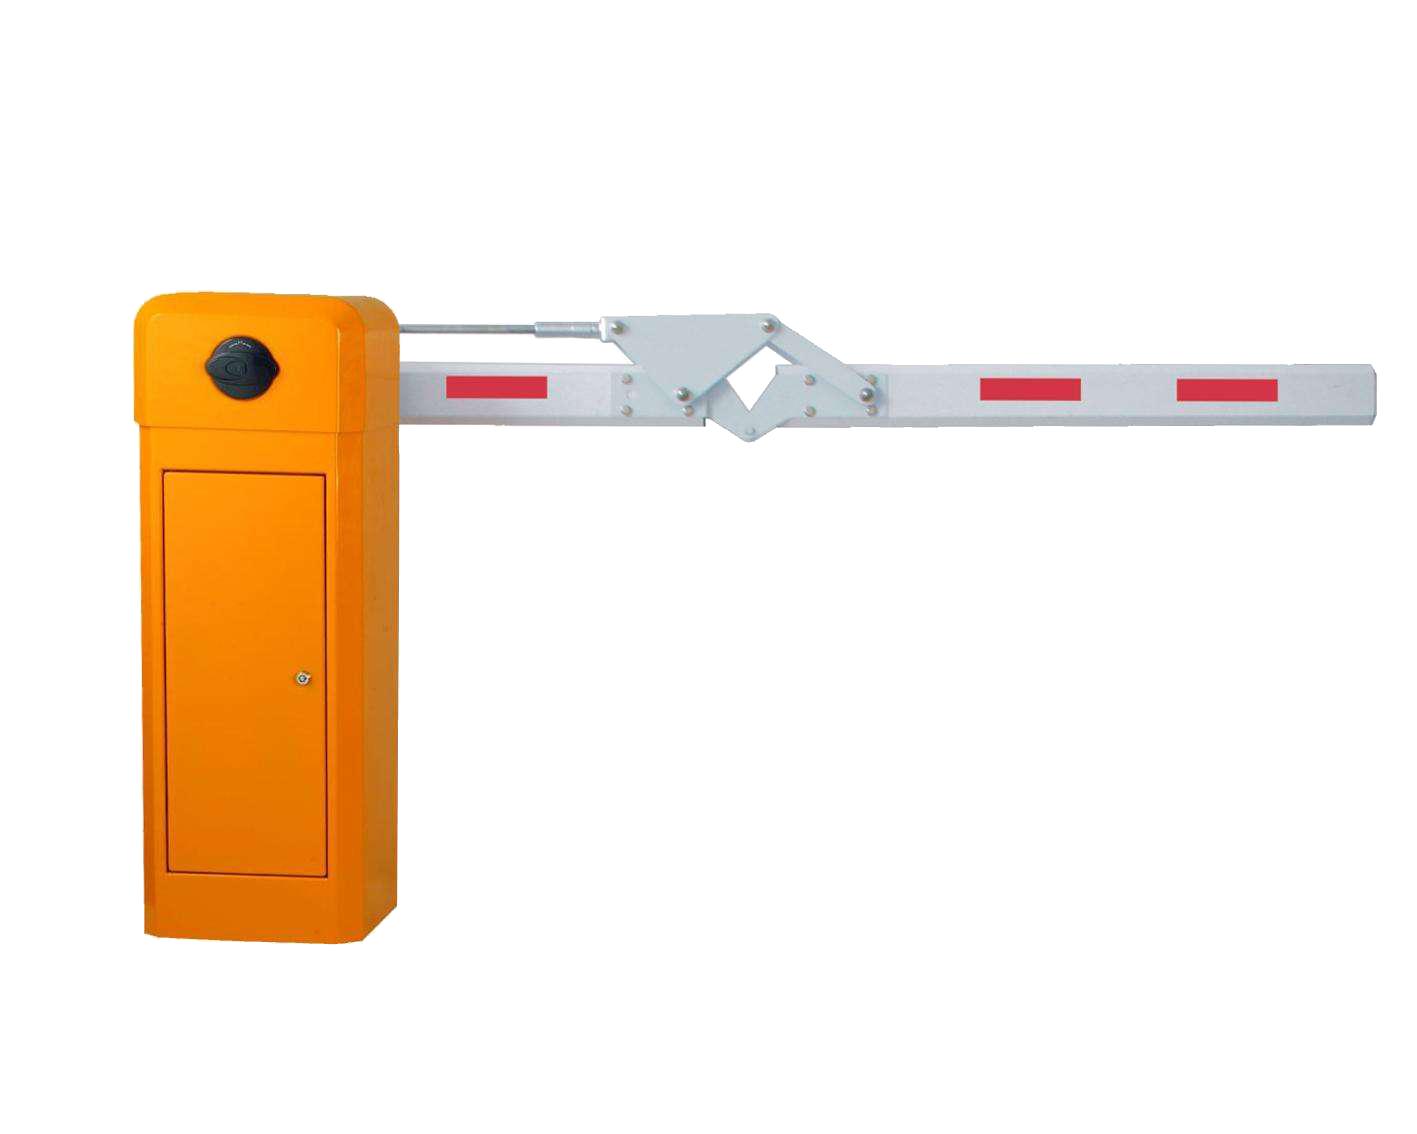 kisspng-automatic-transmission-boom-barrier-turnstile-gate-pedestrian-access-gates-brush-card-gates-5a823952a06077.3550775515184837946569